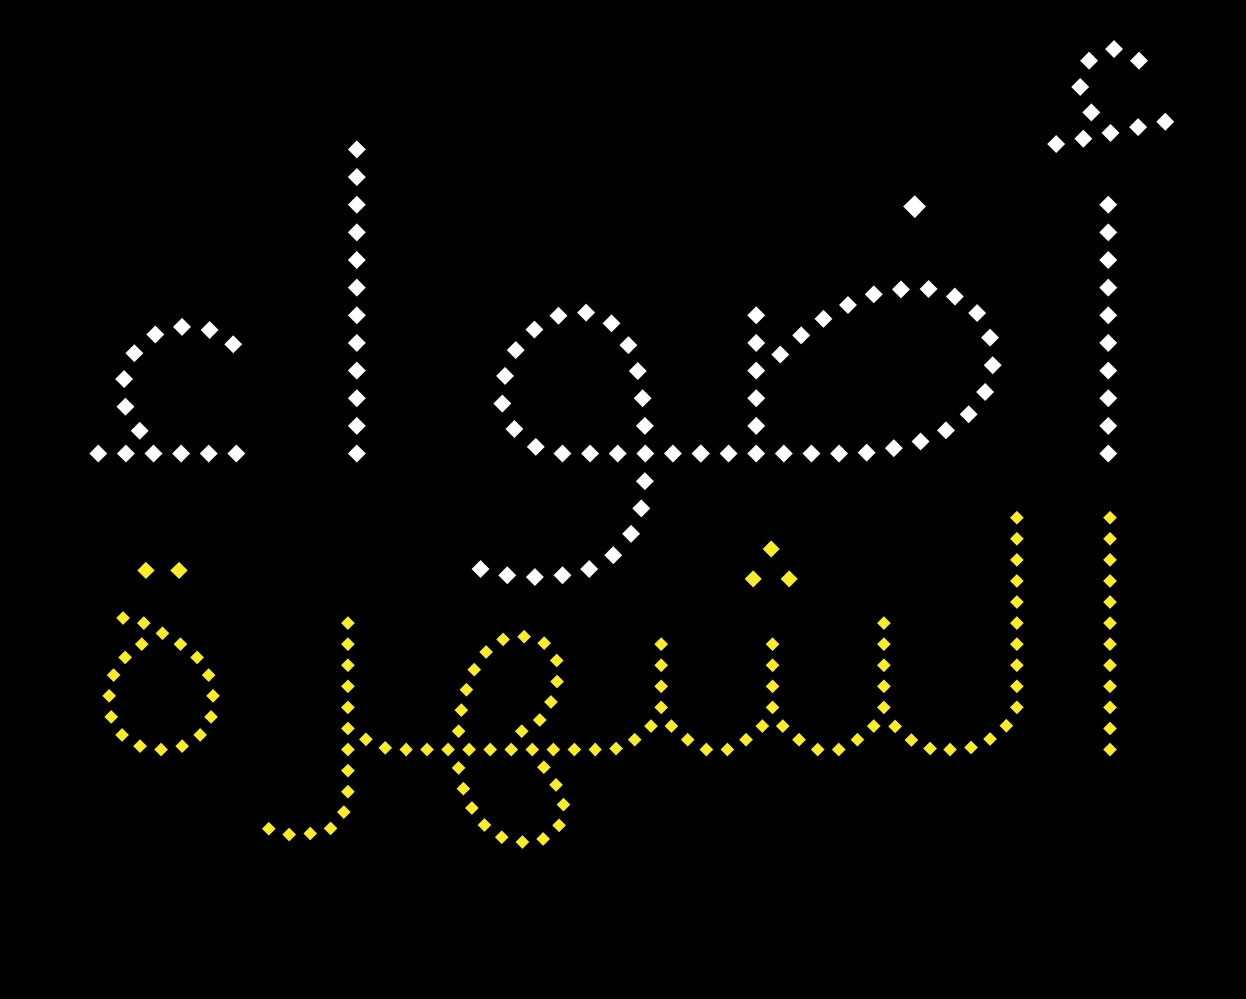 Dotted Arabic font - الخط العربي المُنقط - About this font